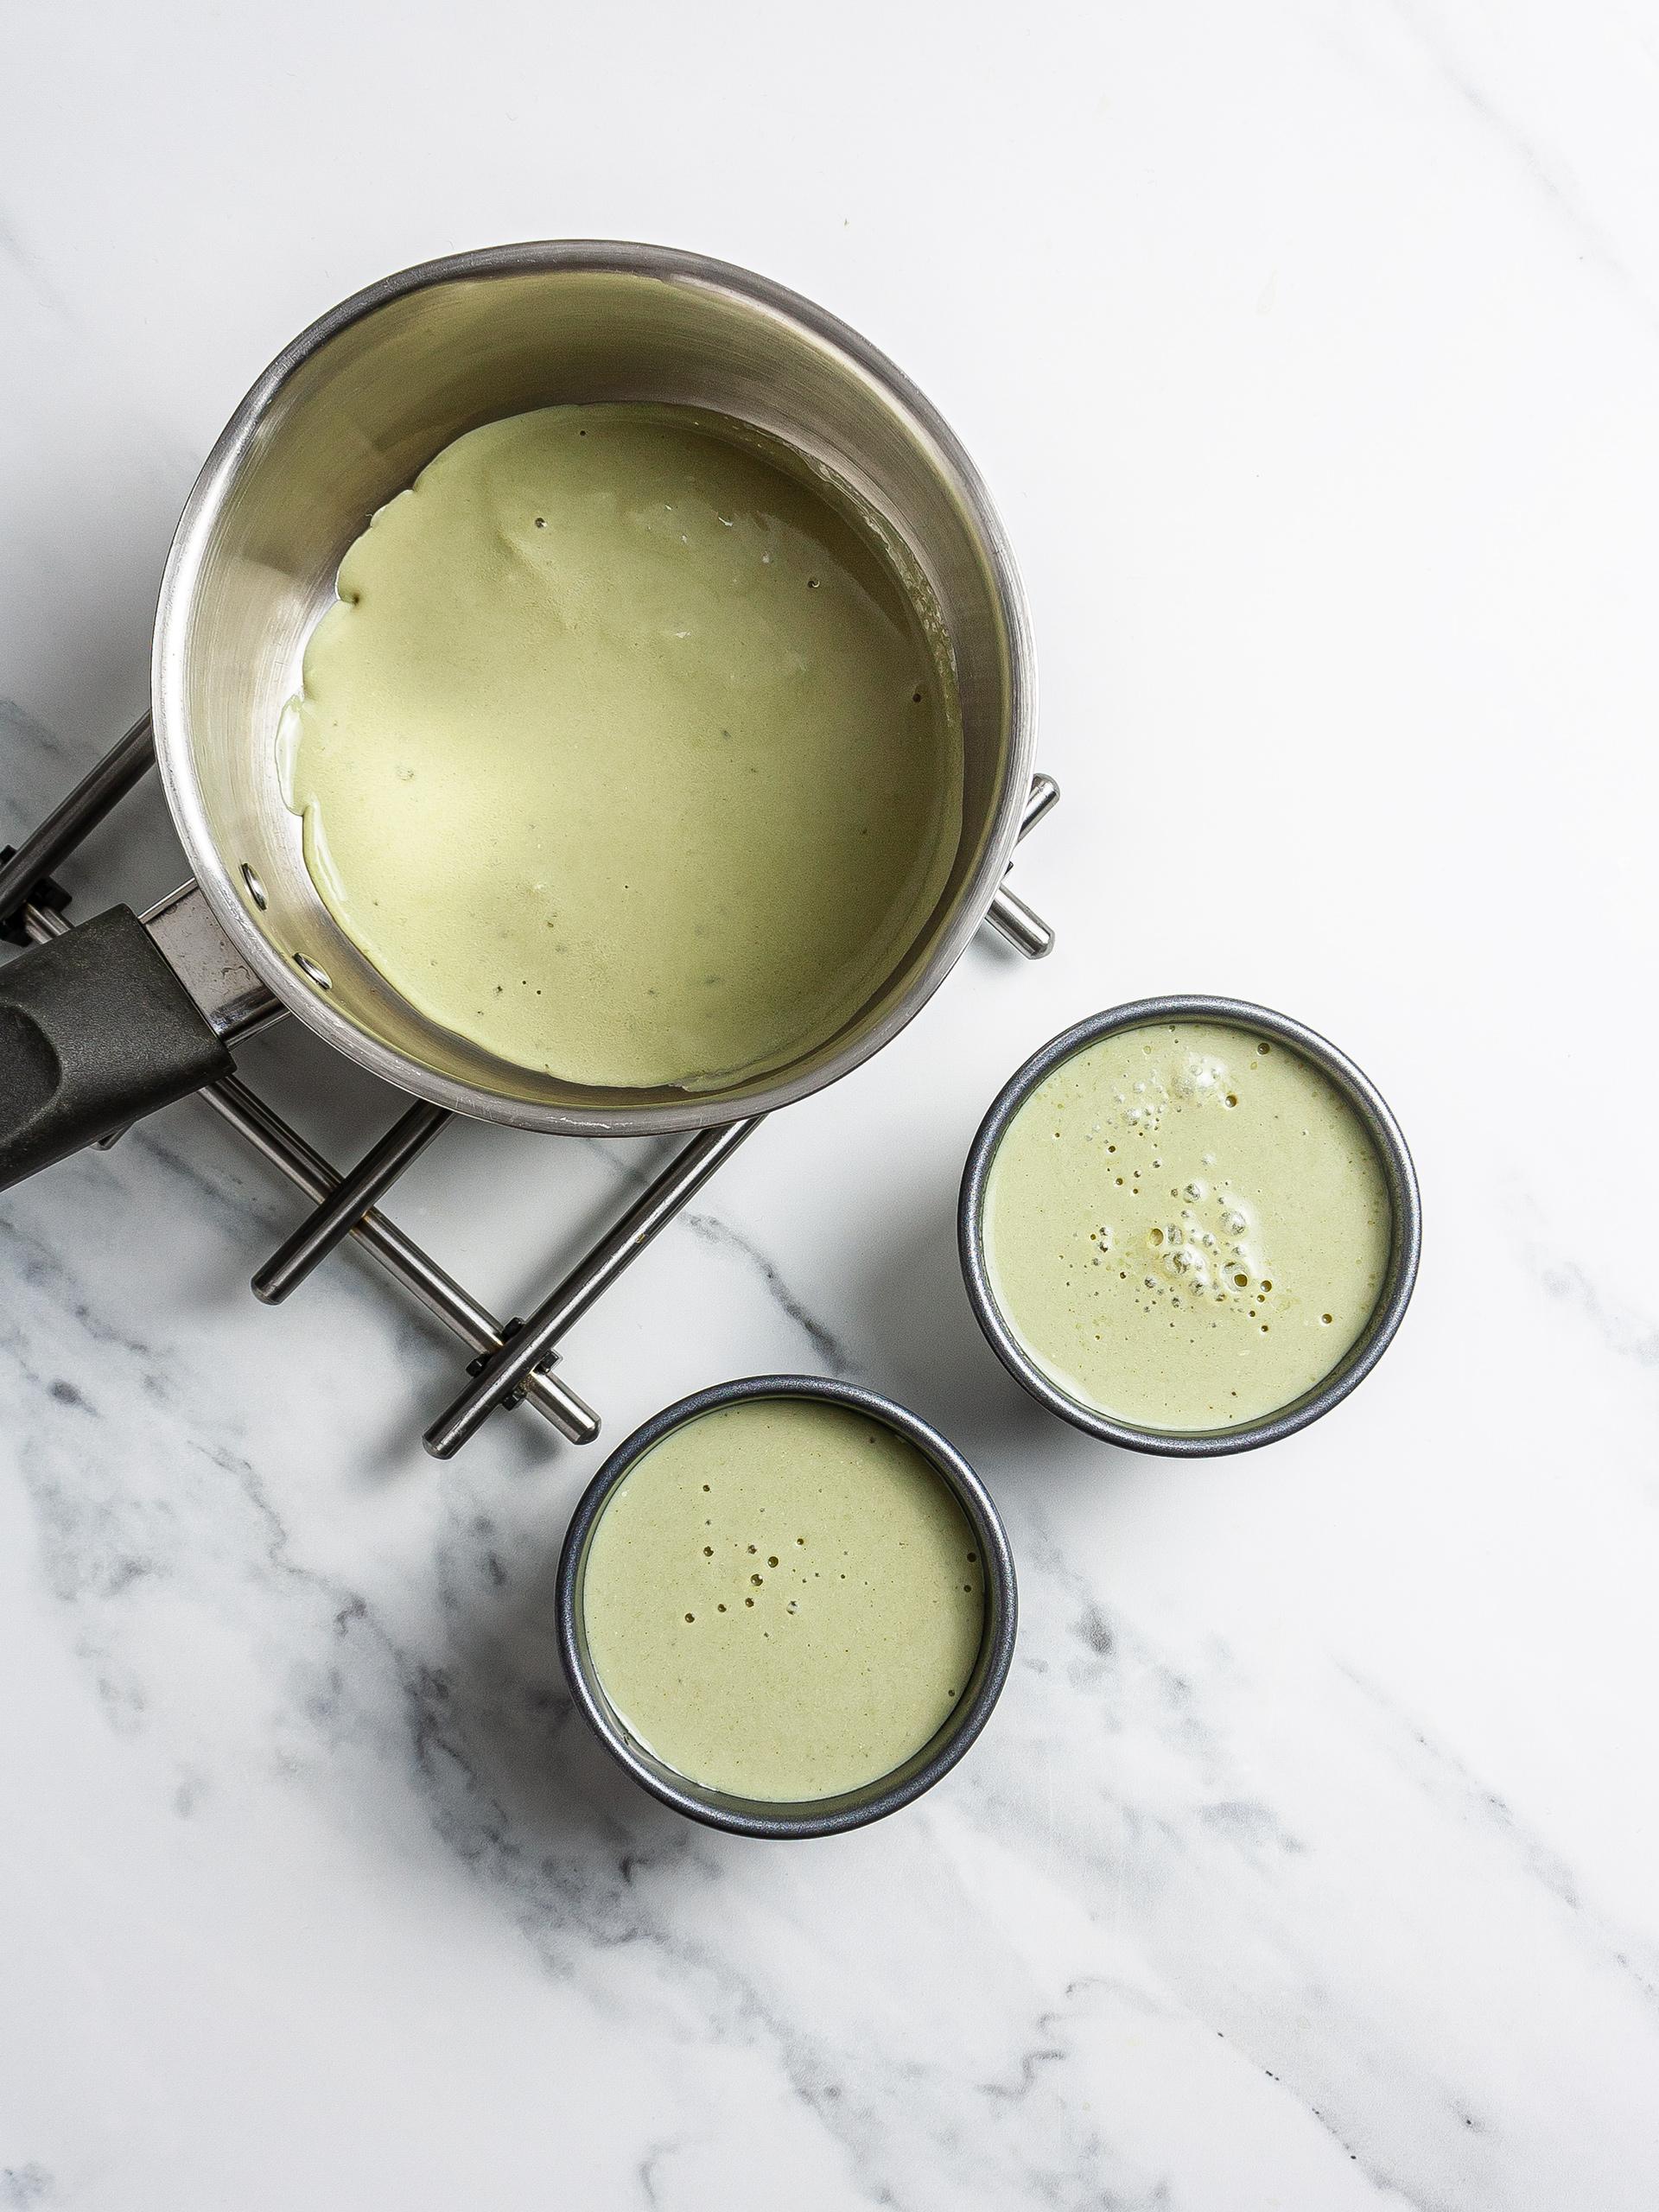 Matcha pudding in ramekins